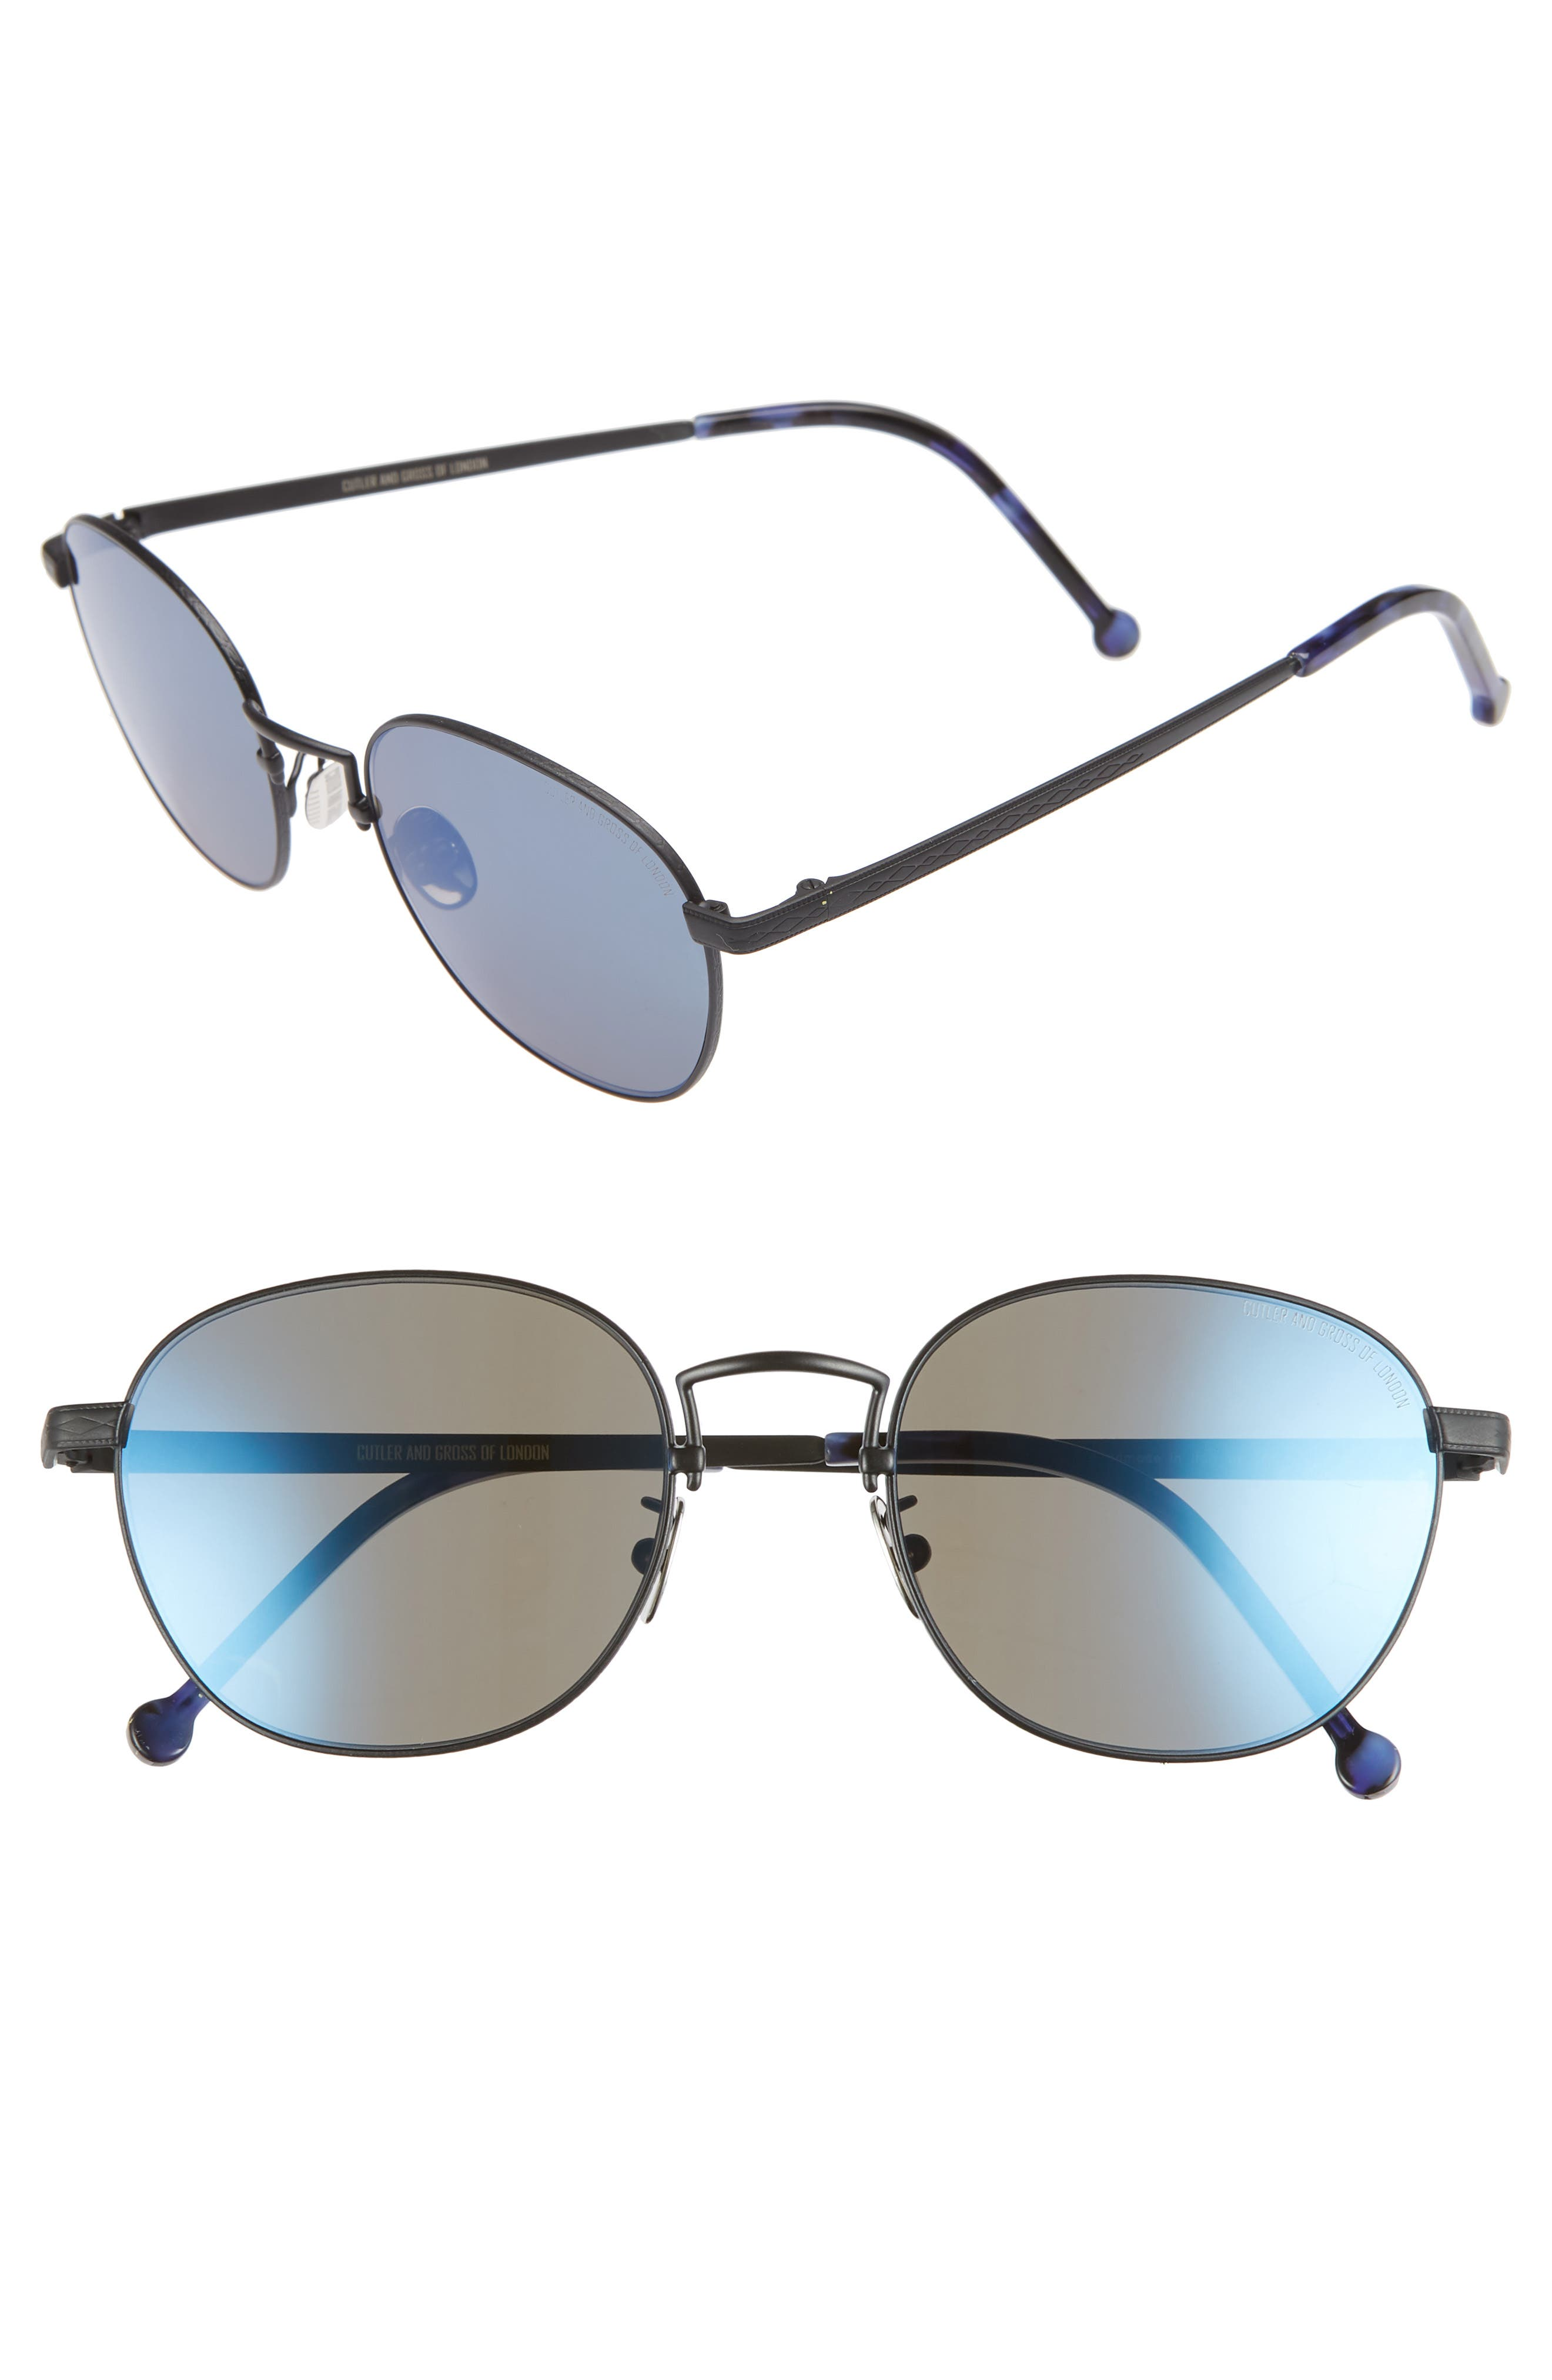 CUTLER AND GROSS 52mm Polarized Round Sunglasses, Main, color, SATIN PALLADIUM/ BLUE